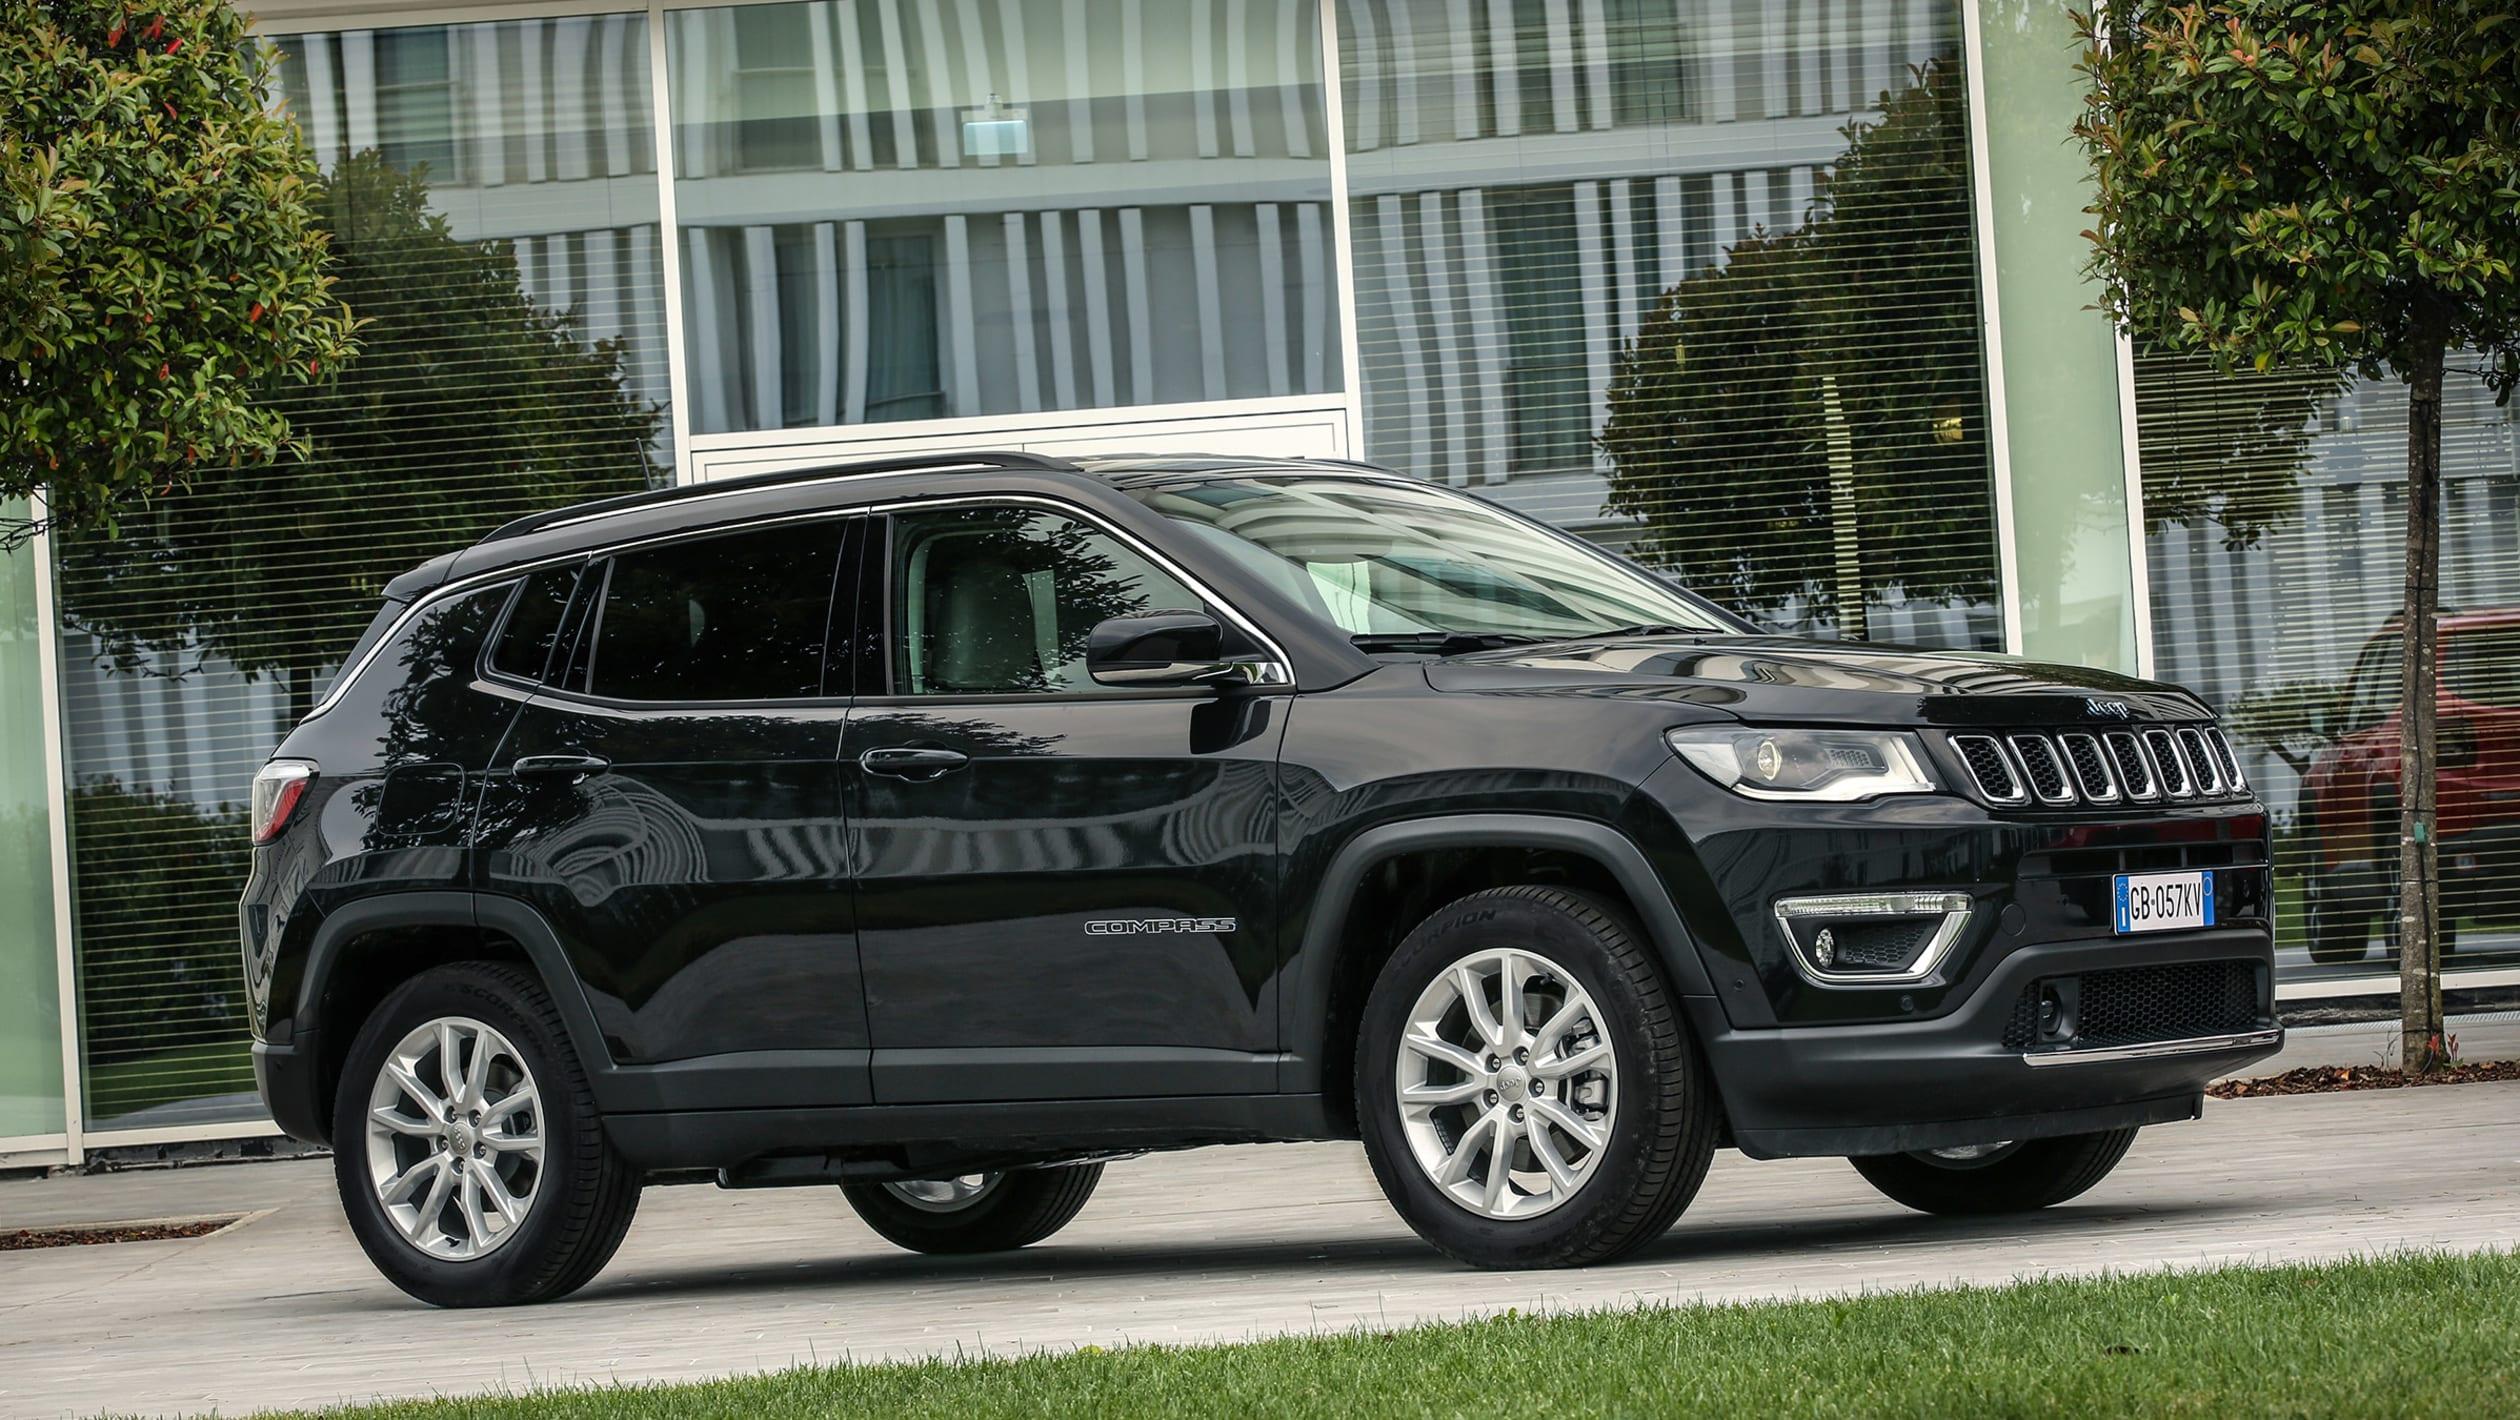 2016 - [Jeep] Compass II - Page 6 Jeep%20Compass%204xe%202020-6